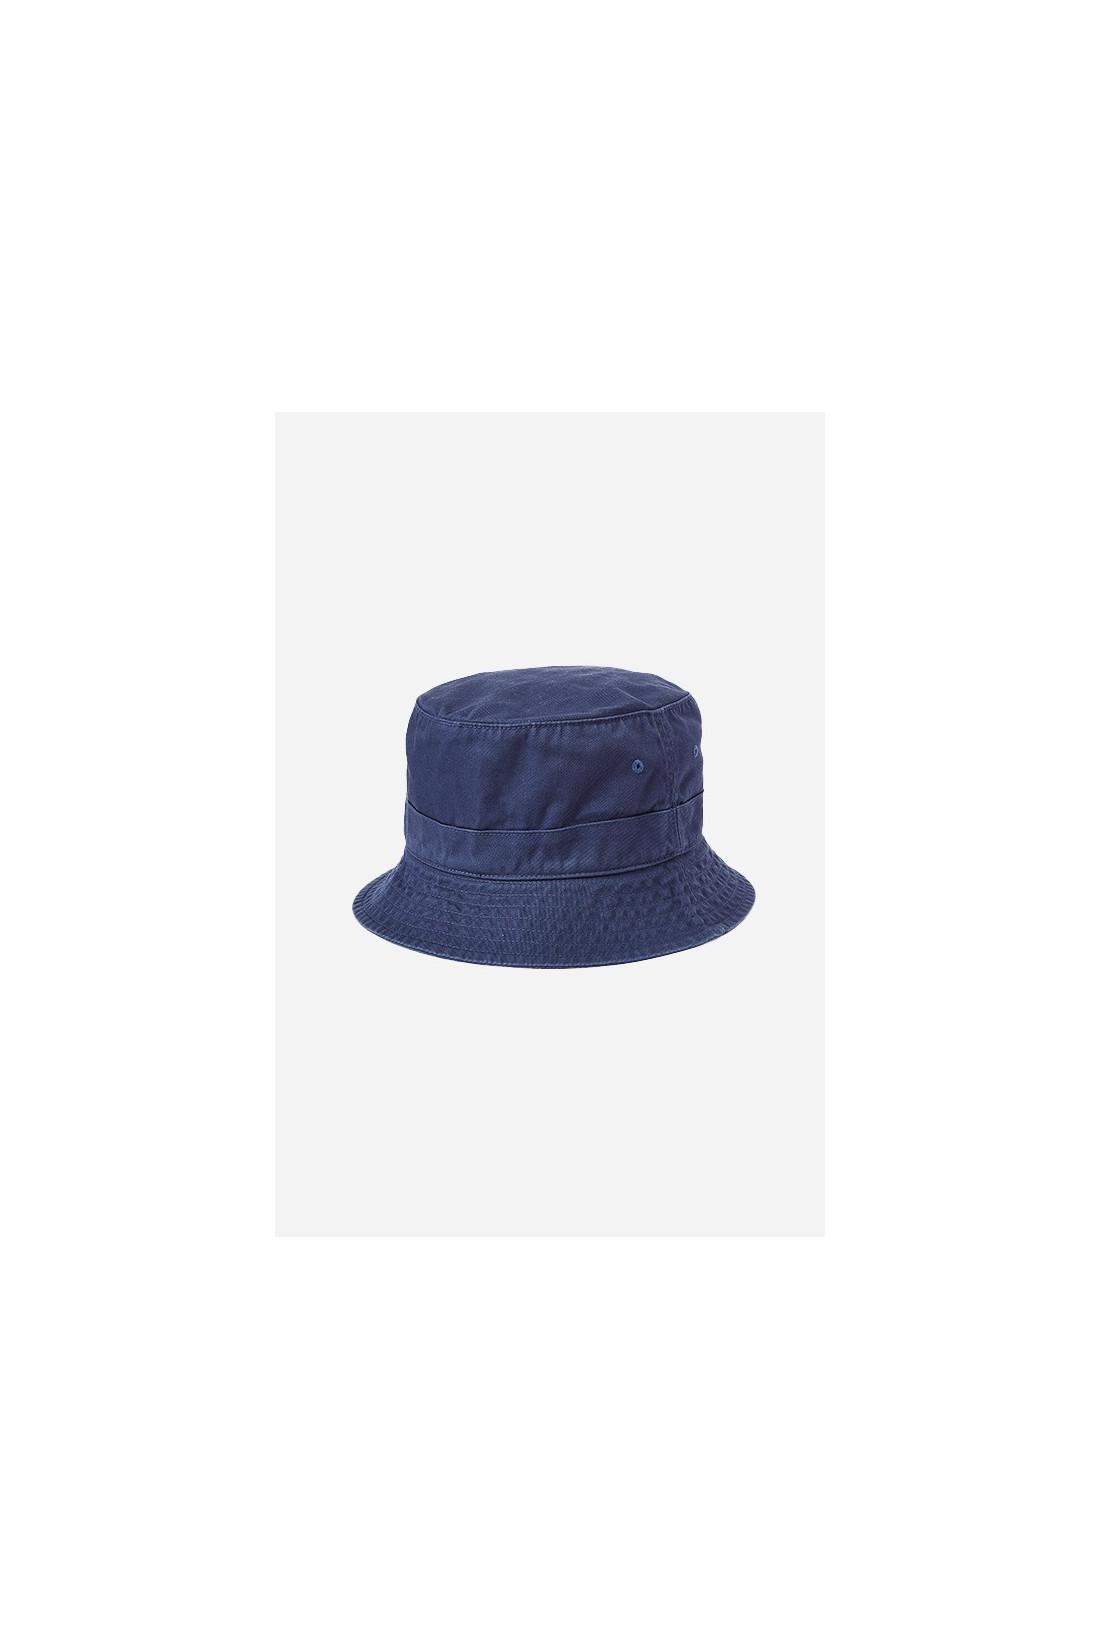 POLO RALPH LAUREN / Loft bucket hat cotton chino Blue